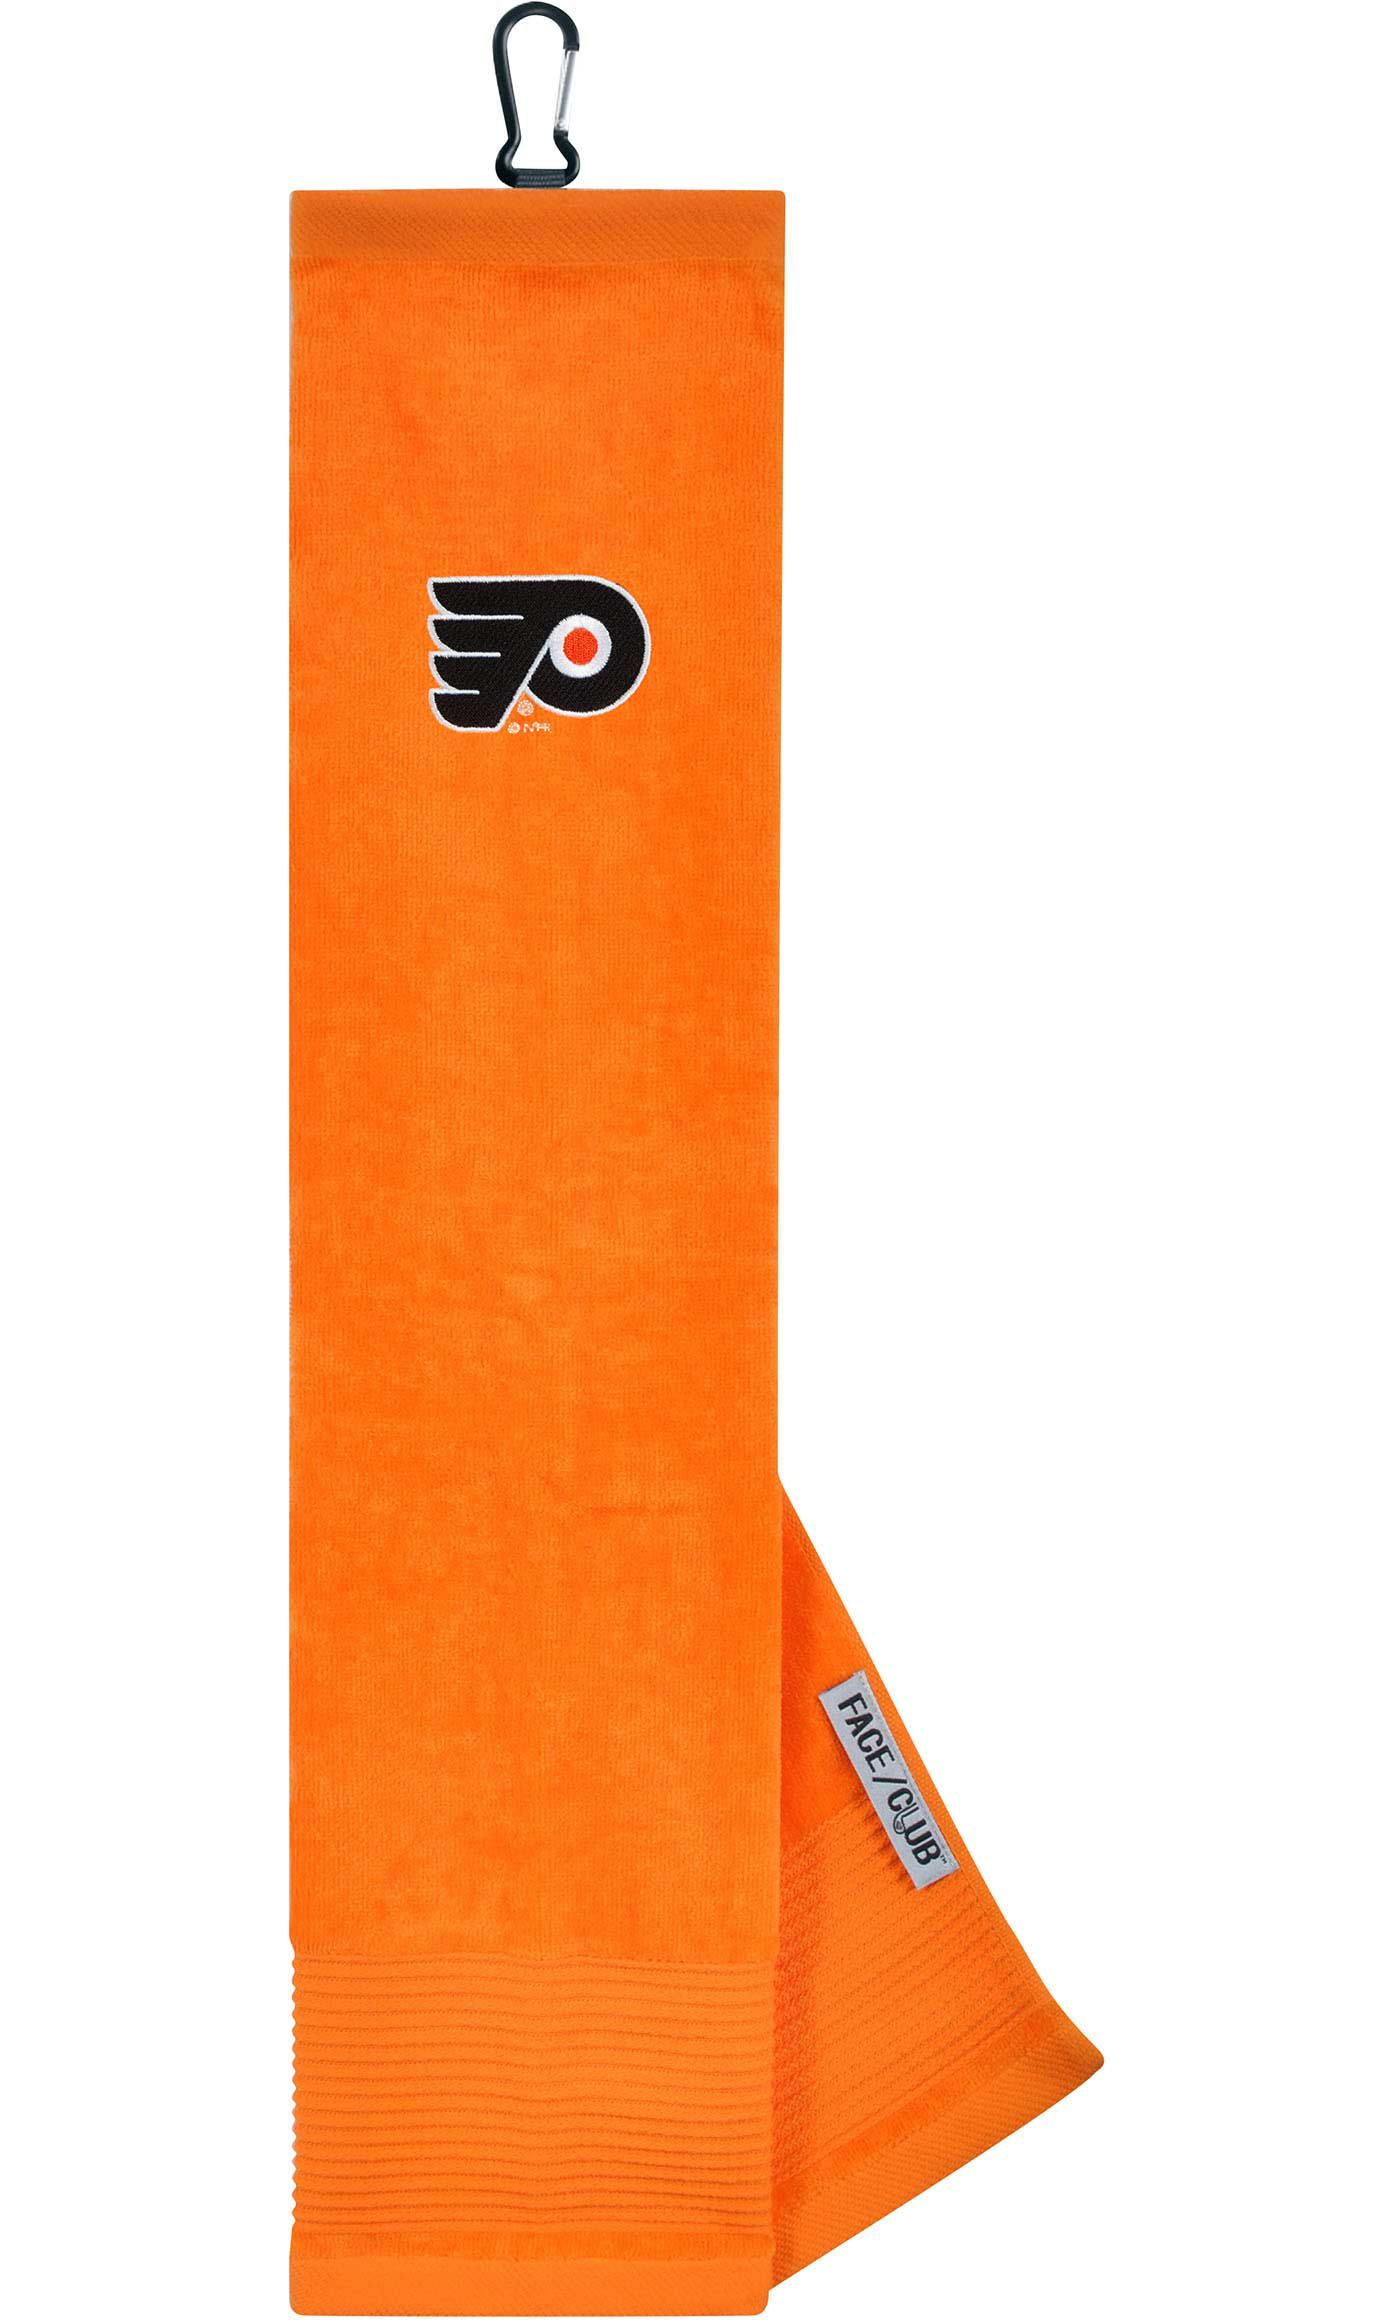 Team Effort Philadelphia Flyers Embroidered Face/Club Tri-Fold Towel